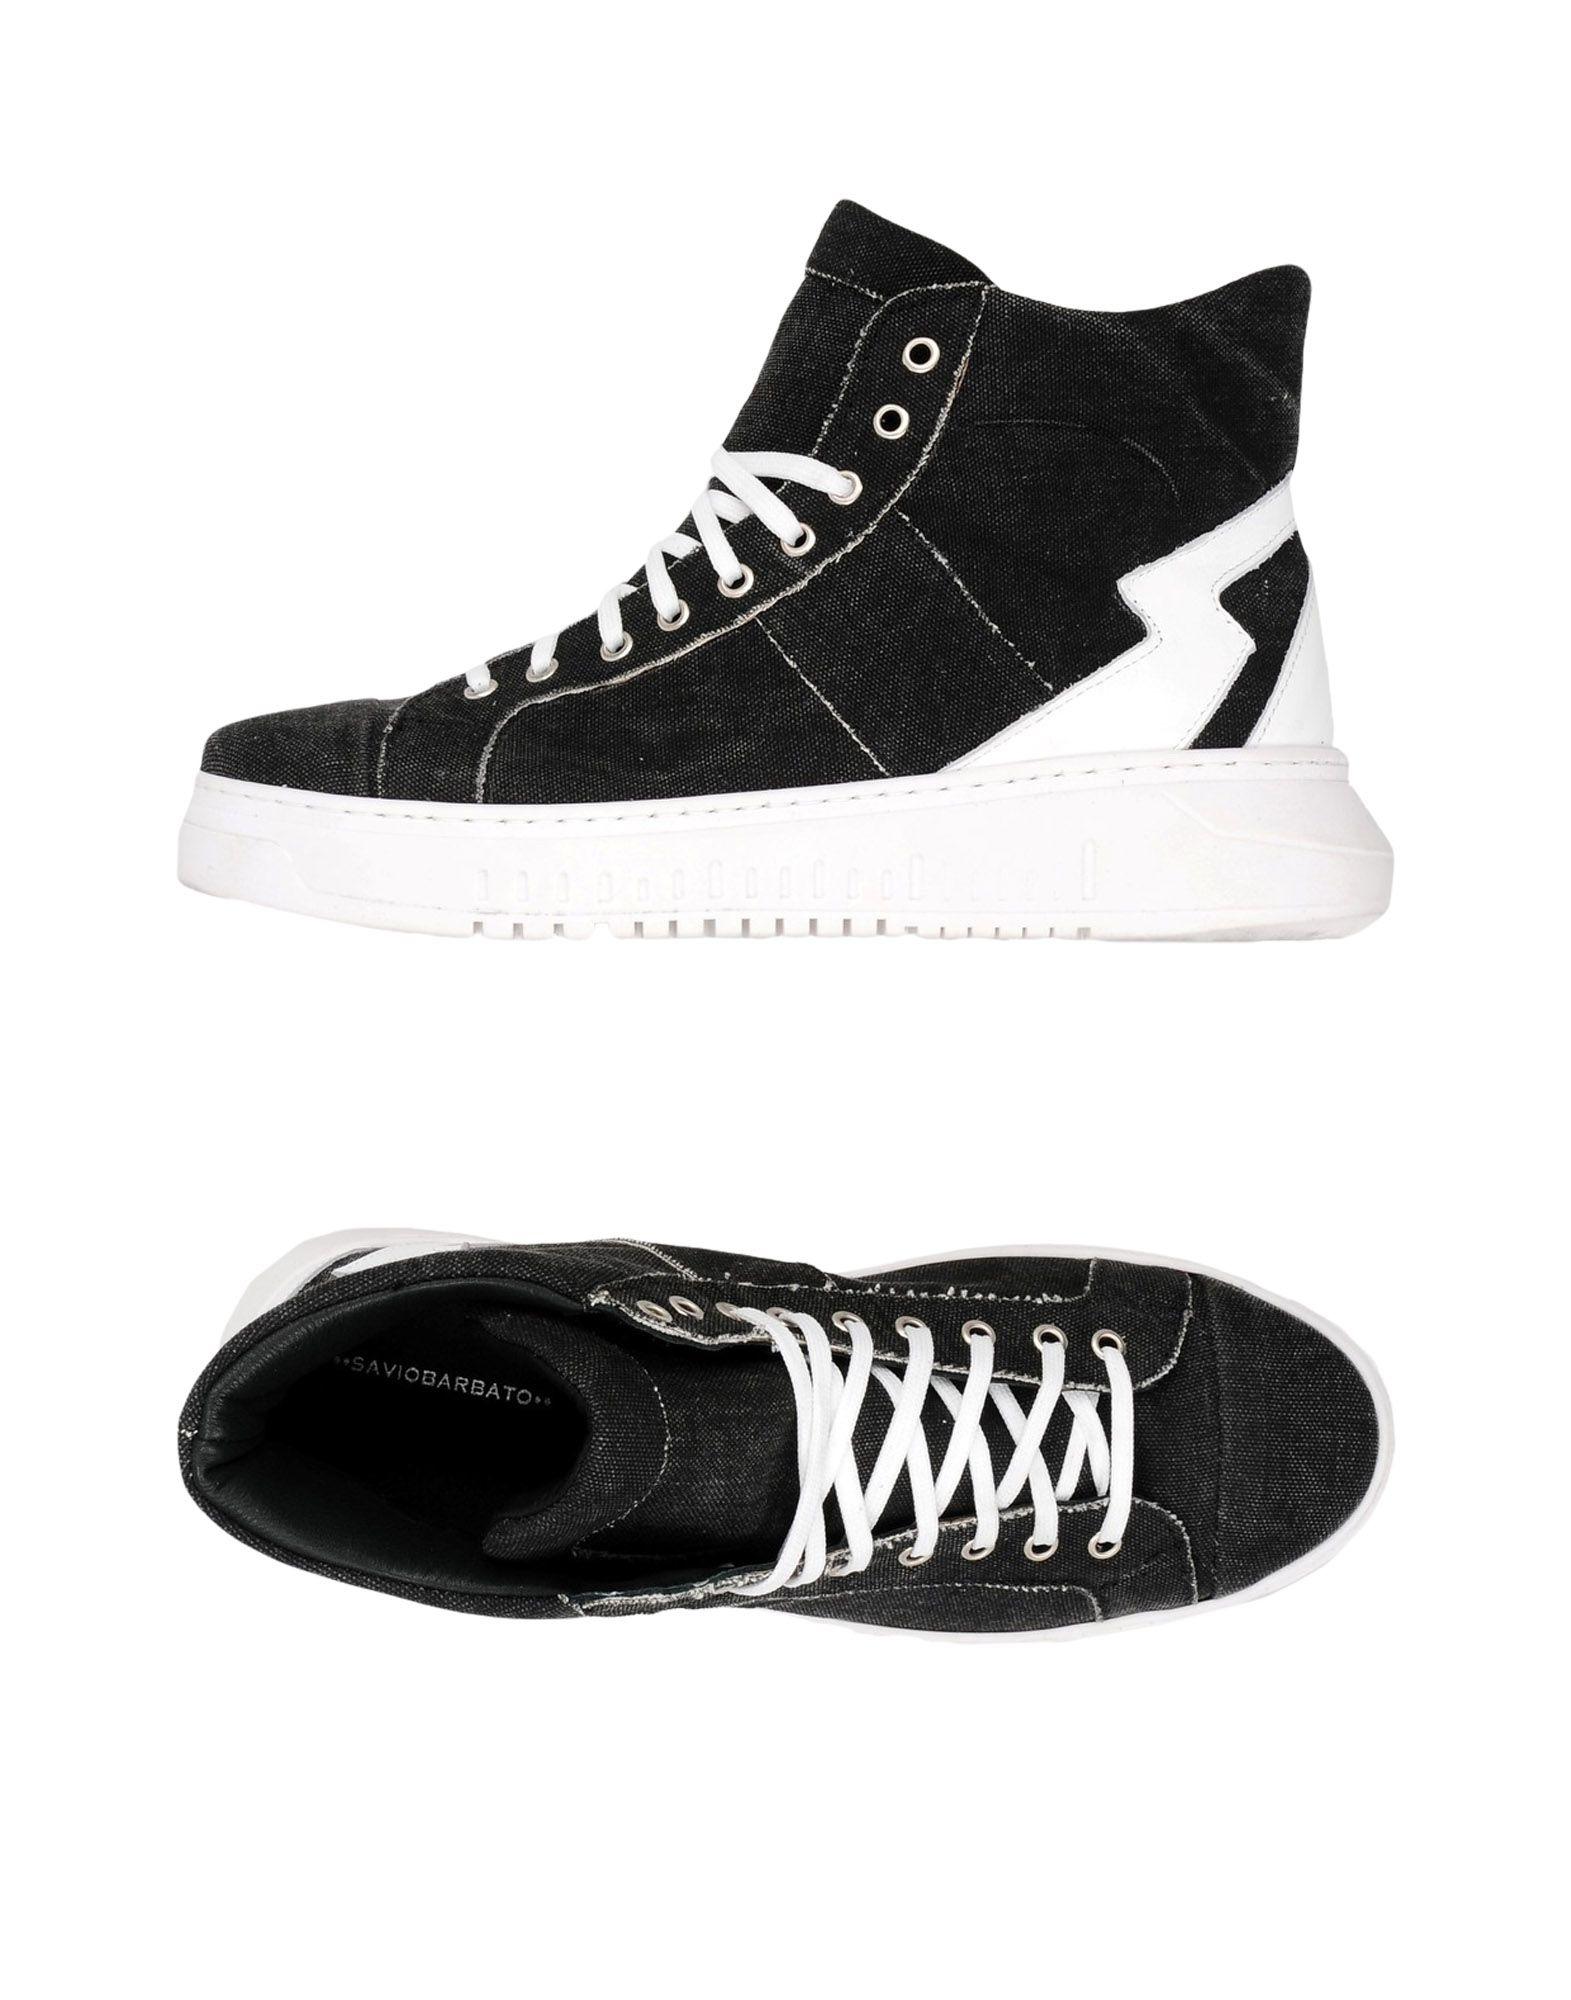 Rabatt echte Schuhe Savio Barbato Sneakers Herren  11447828OF